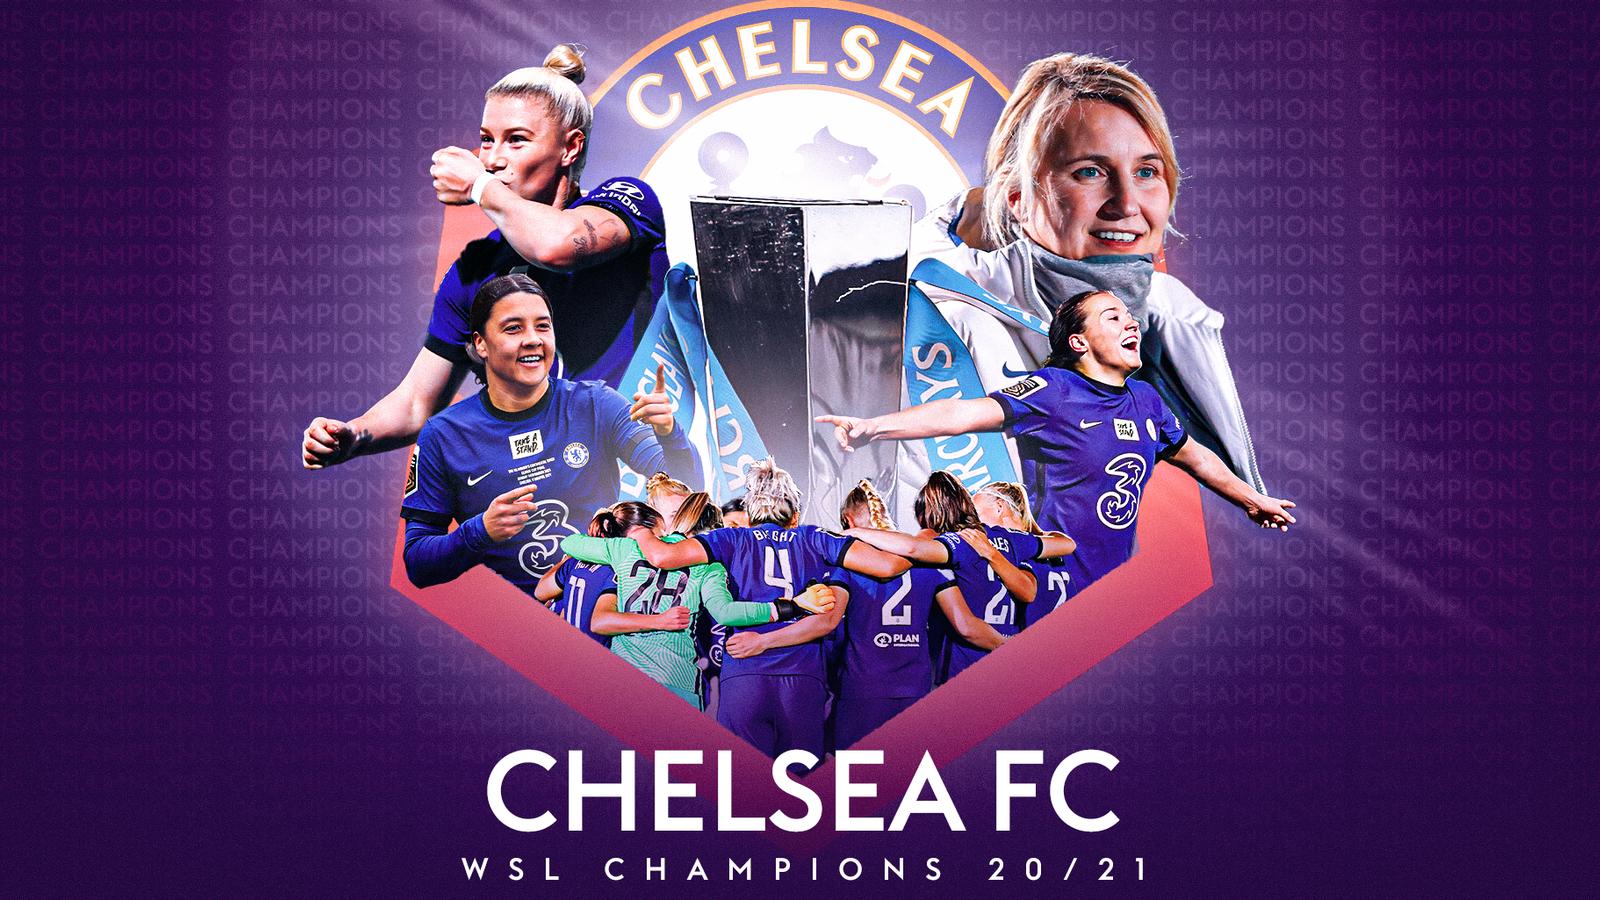 Chelsea Women win 2020/21 Women's Super League title with Man City Women second, Bristol City Women relegated